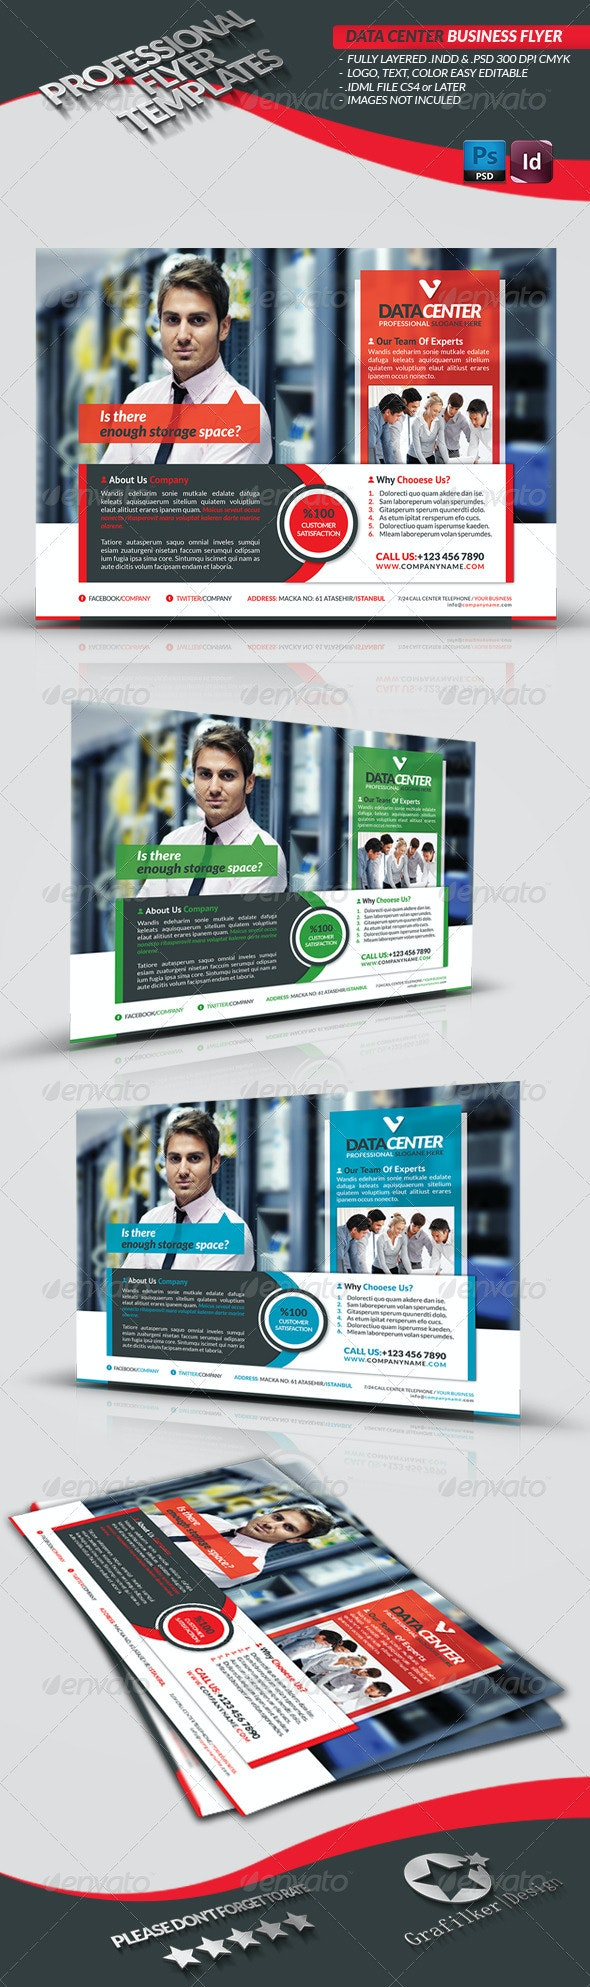 Data Center Business Flyer - Corporate Flyers